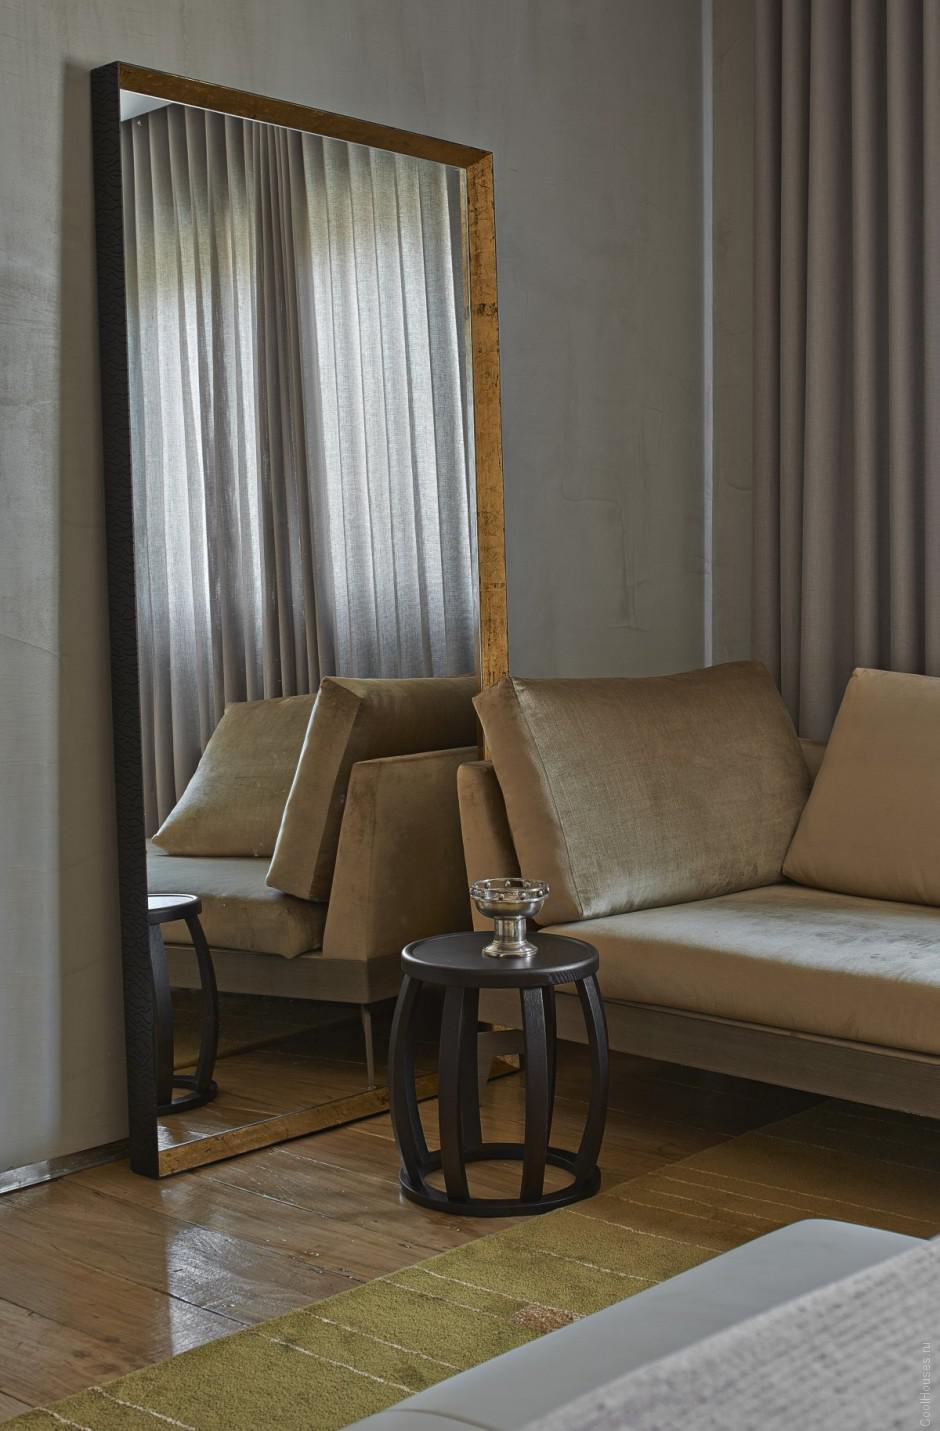 Интерьер внутри дома в Бразилии. Фото от Архитектора